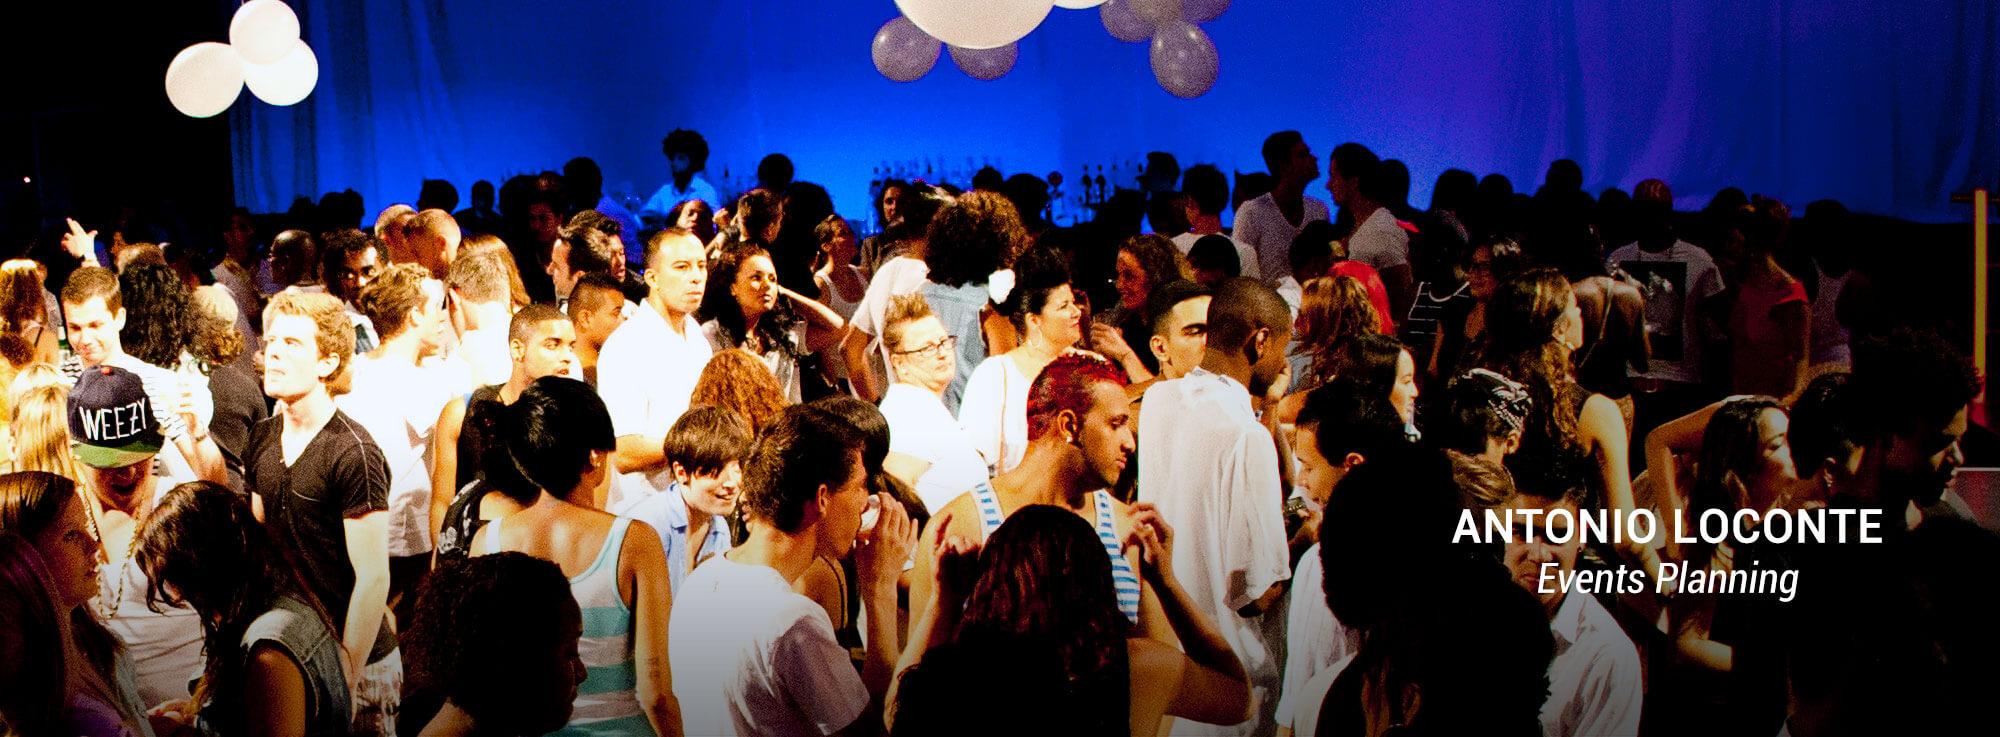 Antonio Loconte Events Planning Barletta